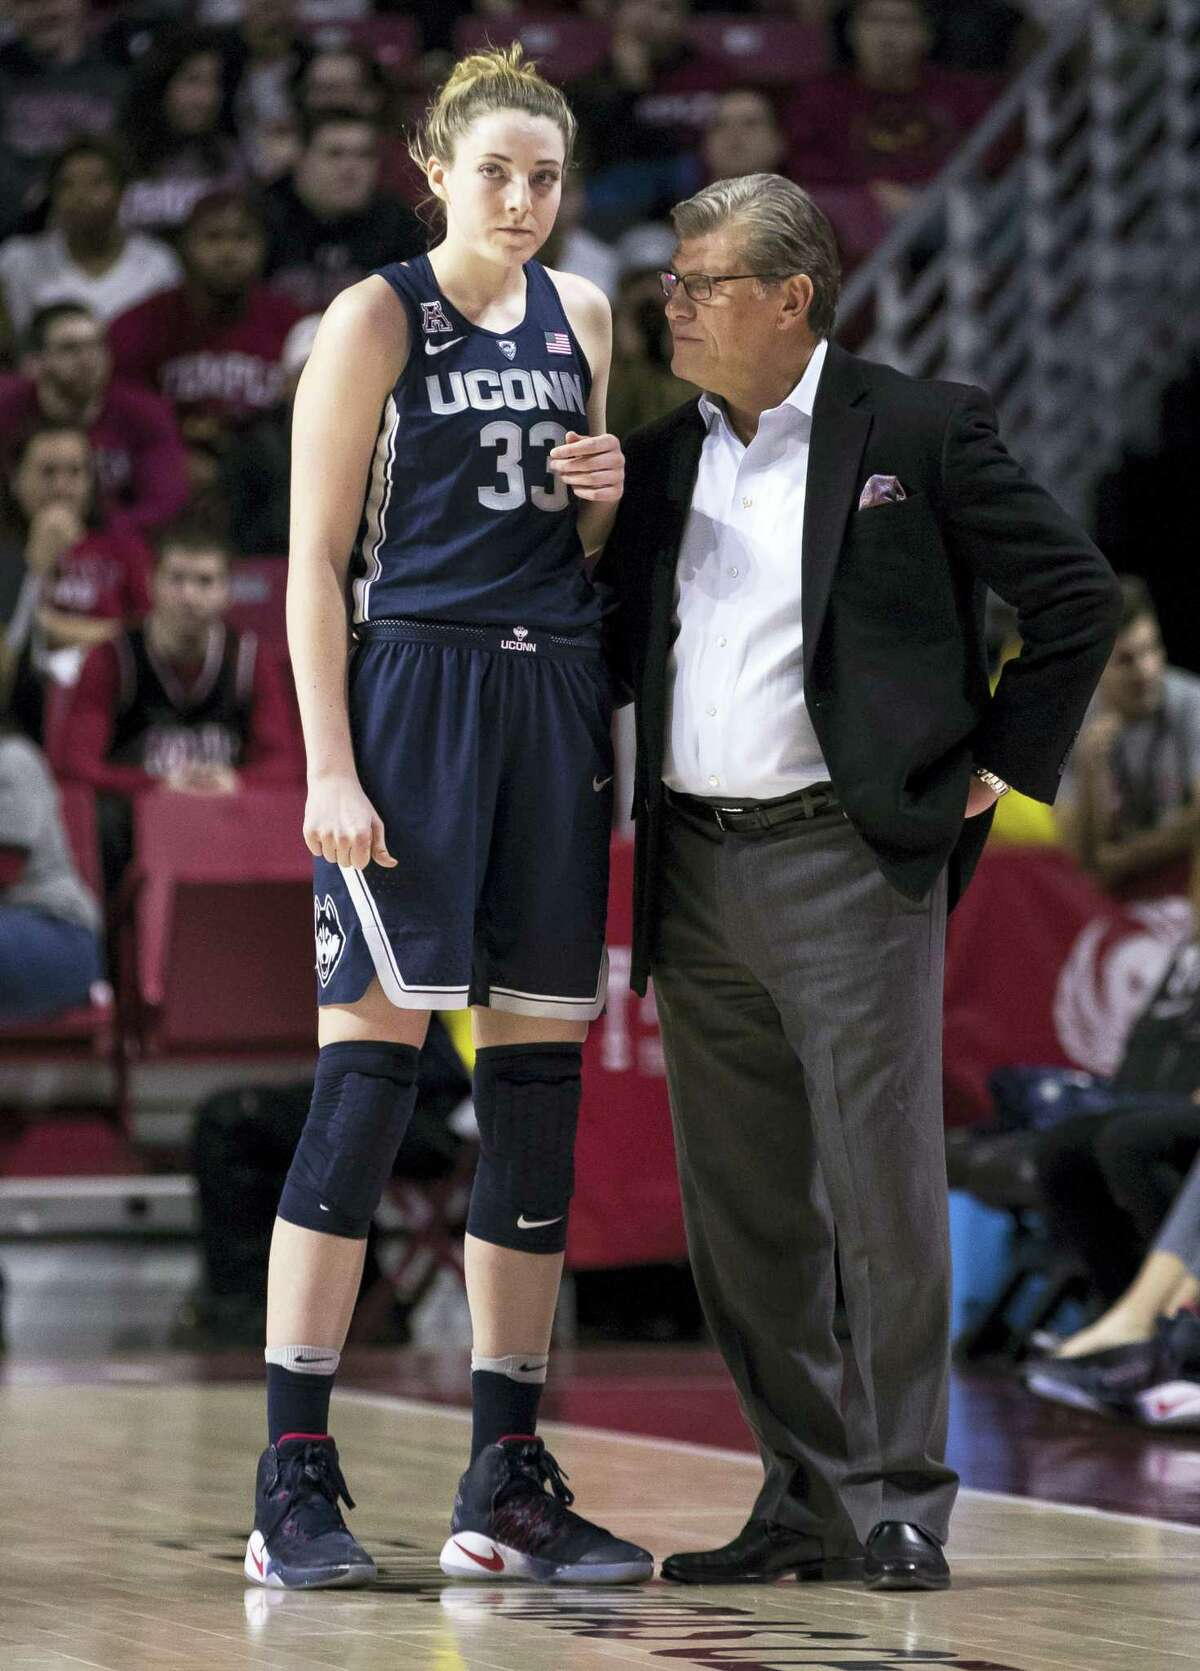 UConn's Katie Lou Samuelson, left, listens to head coach Geno Auriemma.